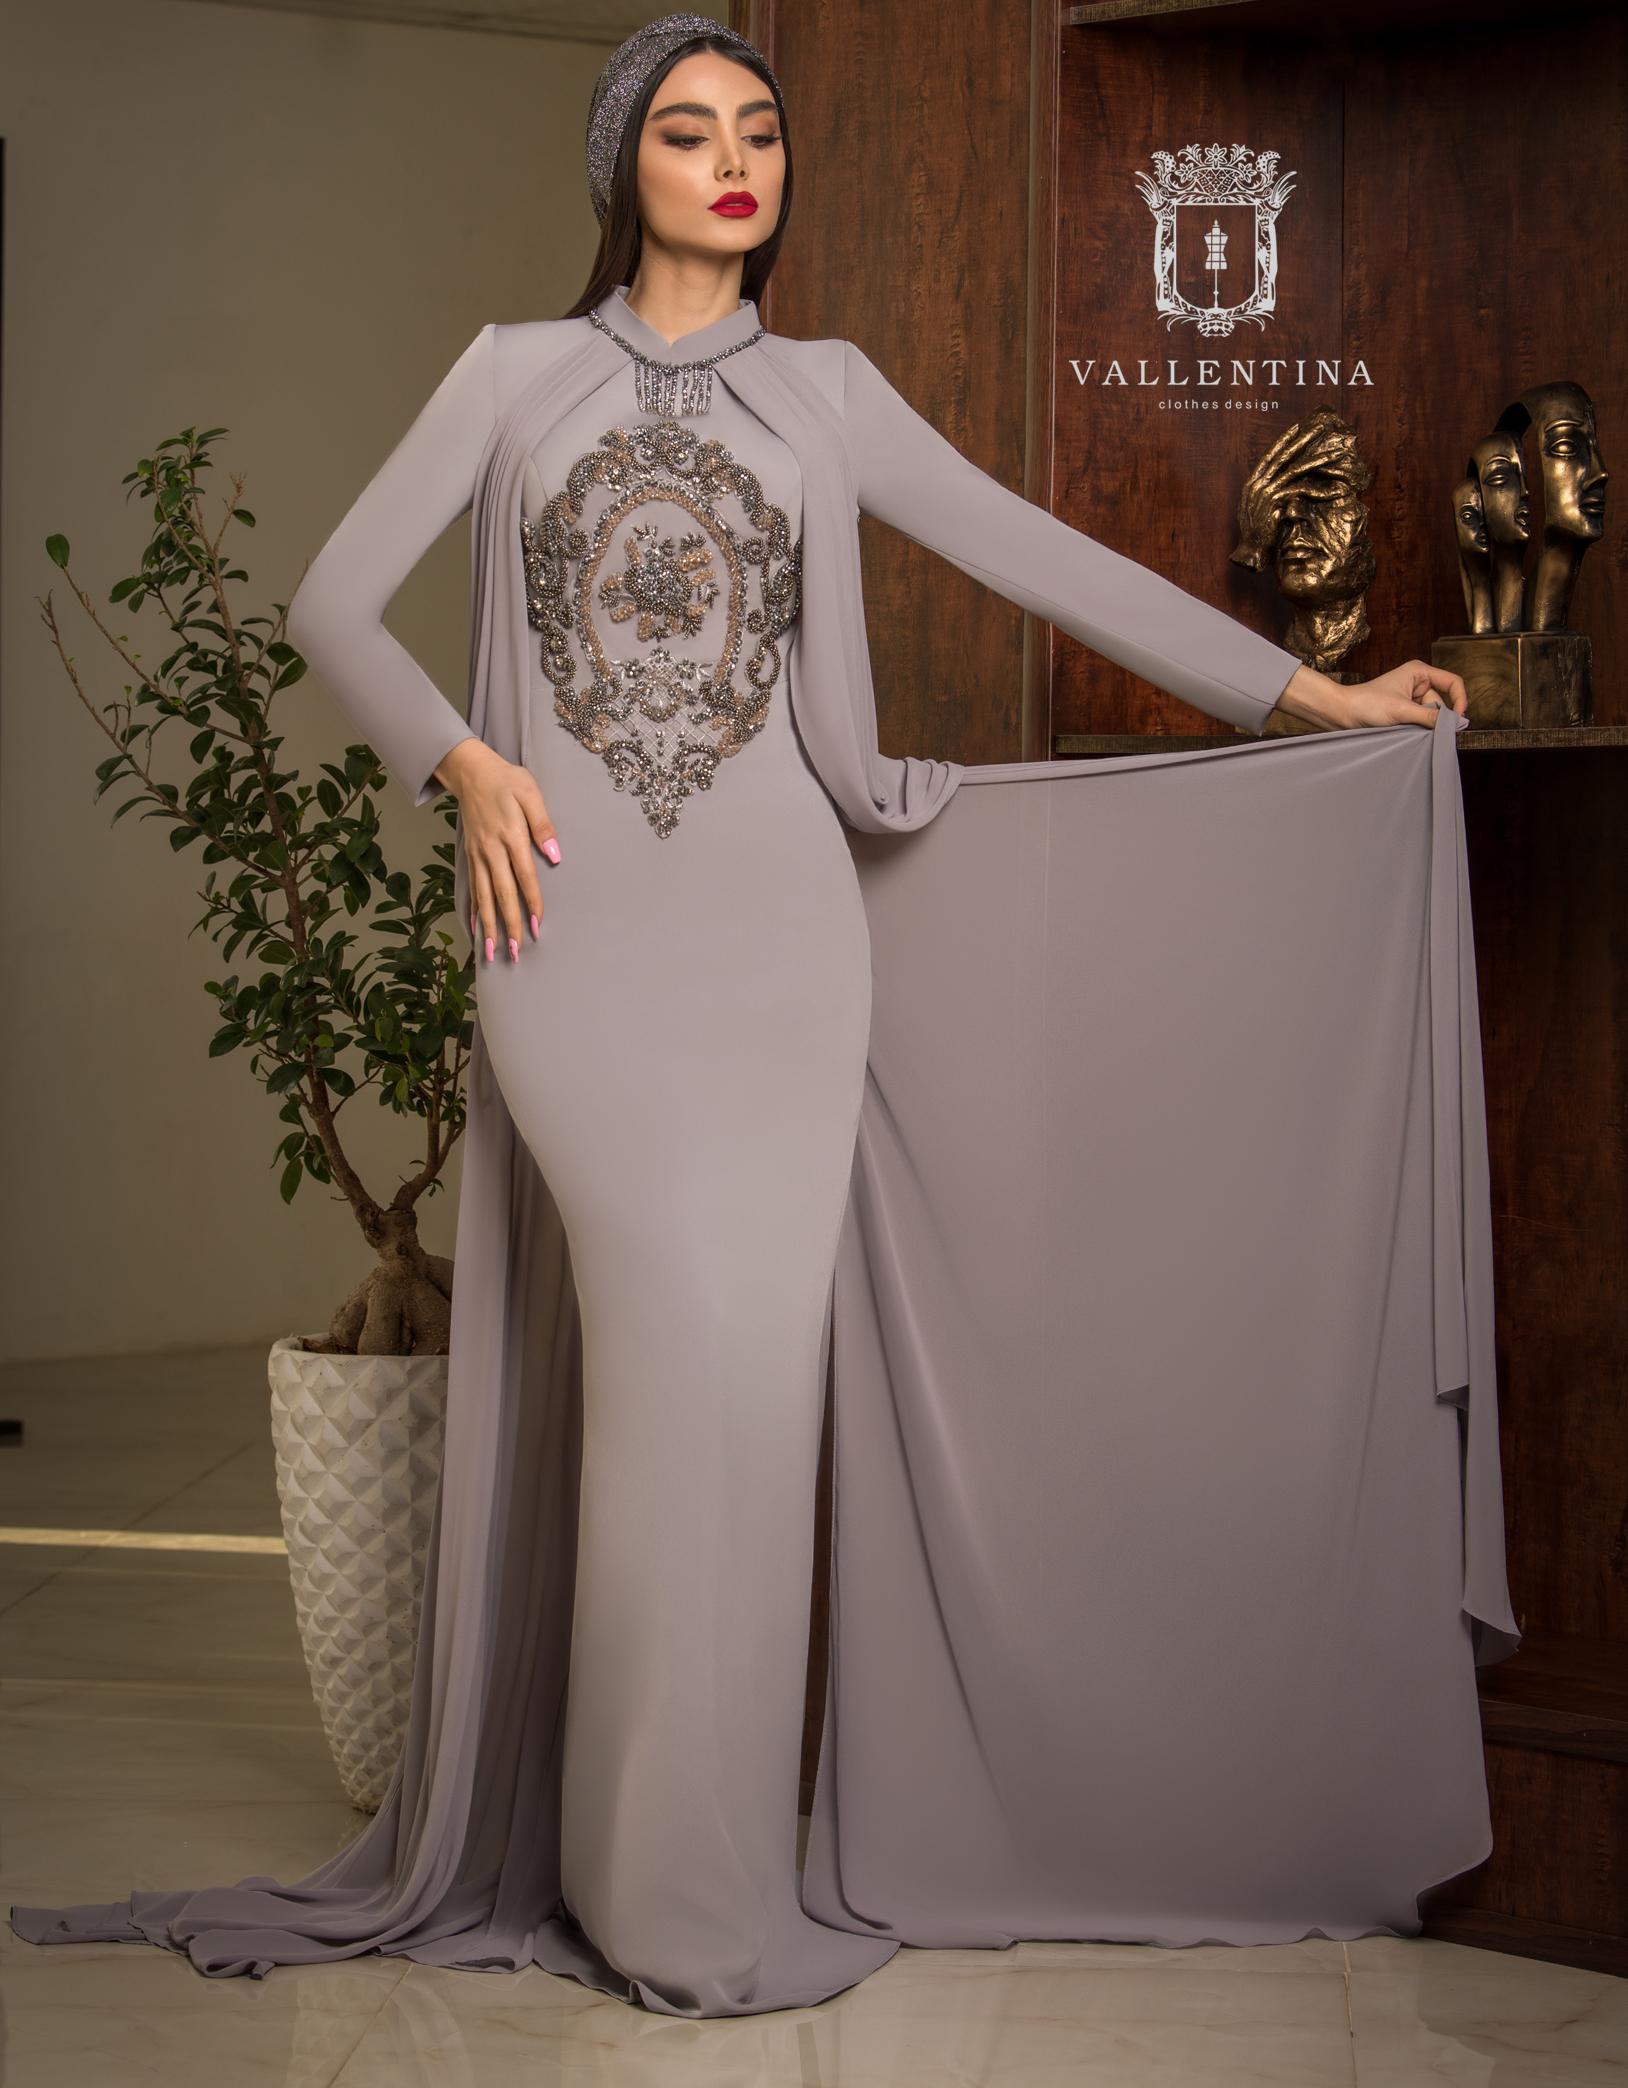 لباس پوشیده مجلسی